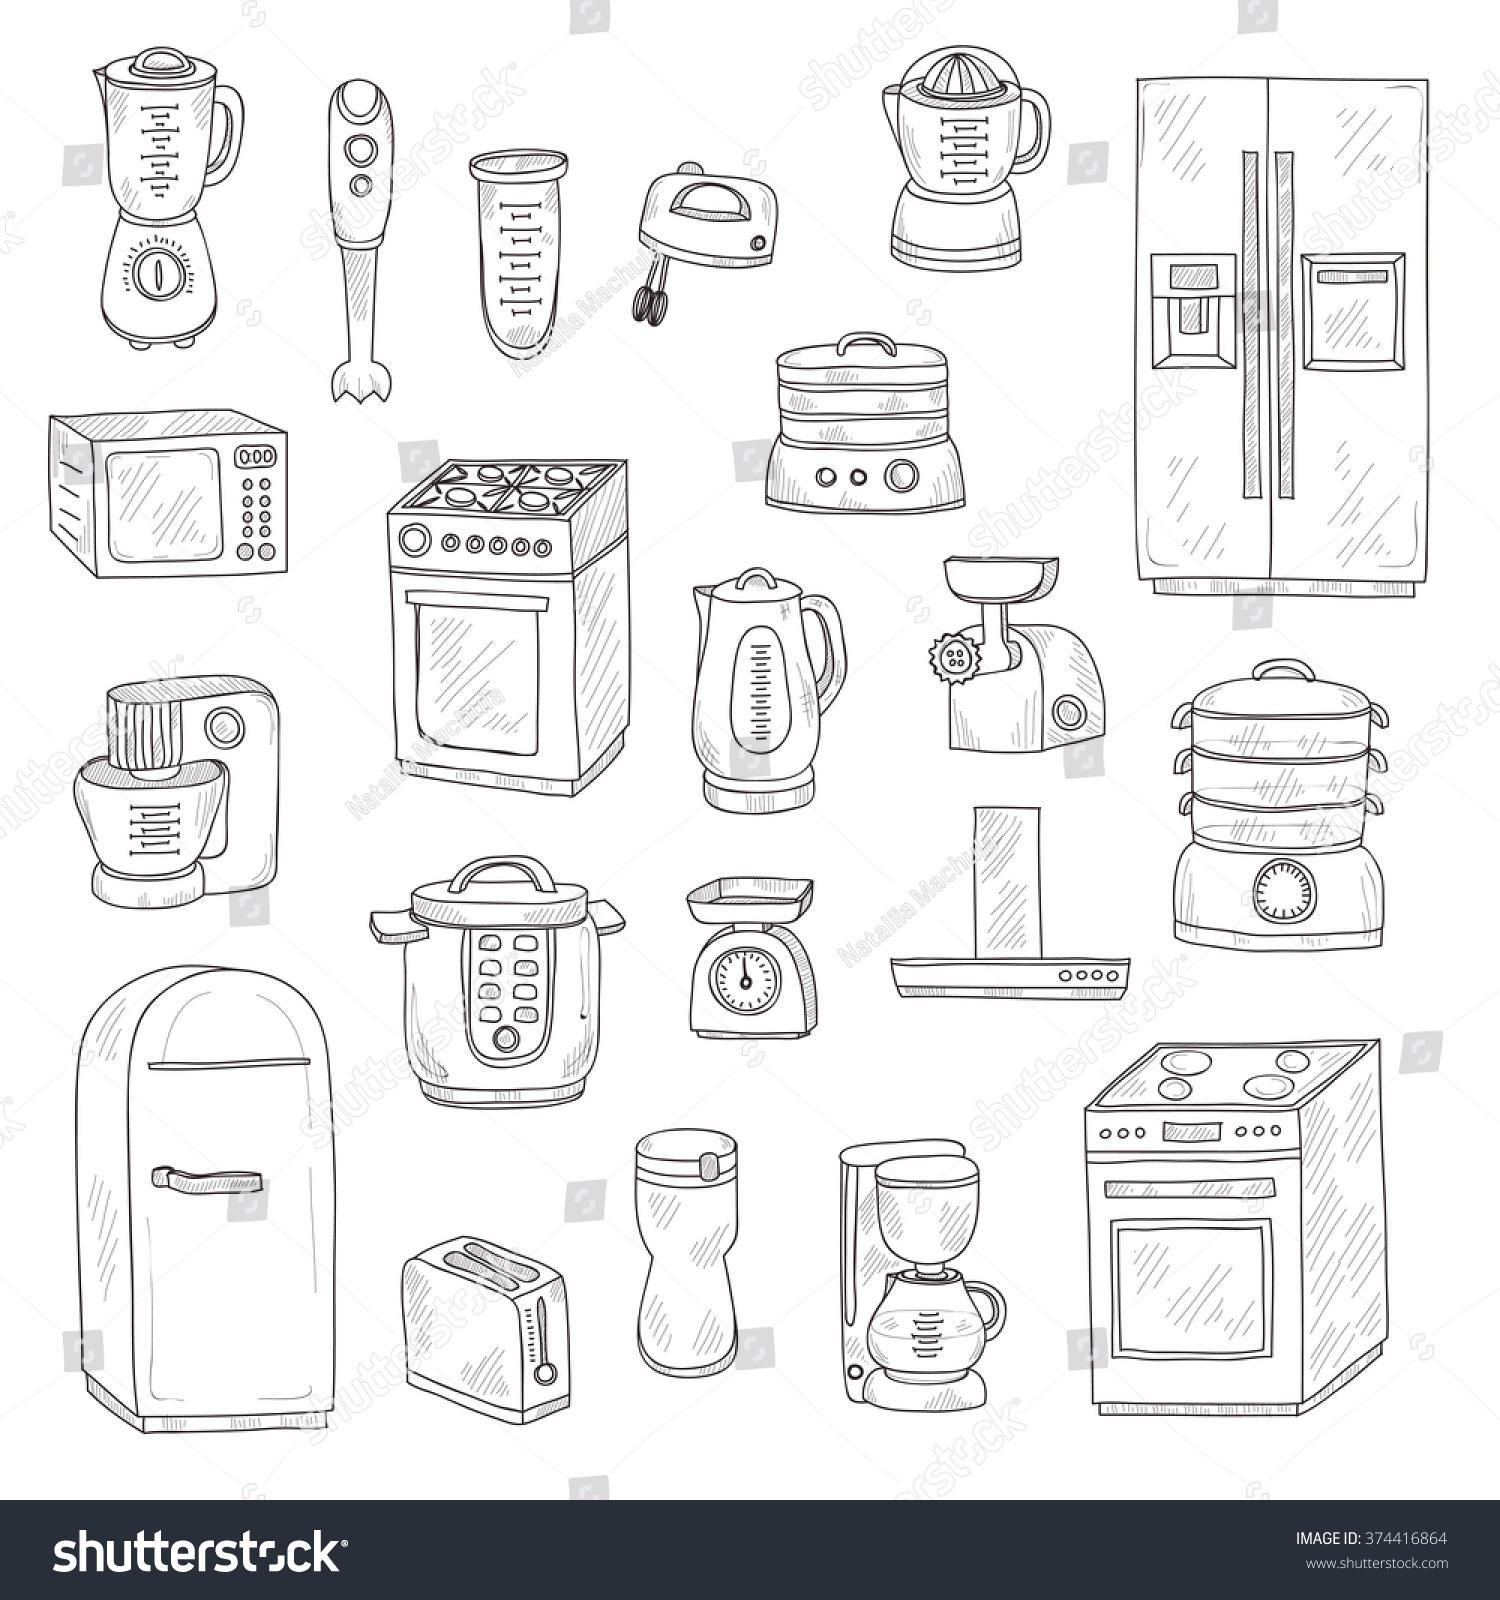 set cute hand drawn kitchen appliances stock vector 374416864 set of cute hand drawn kitchen appliances vector kitchen collection